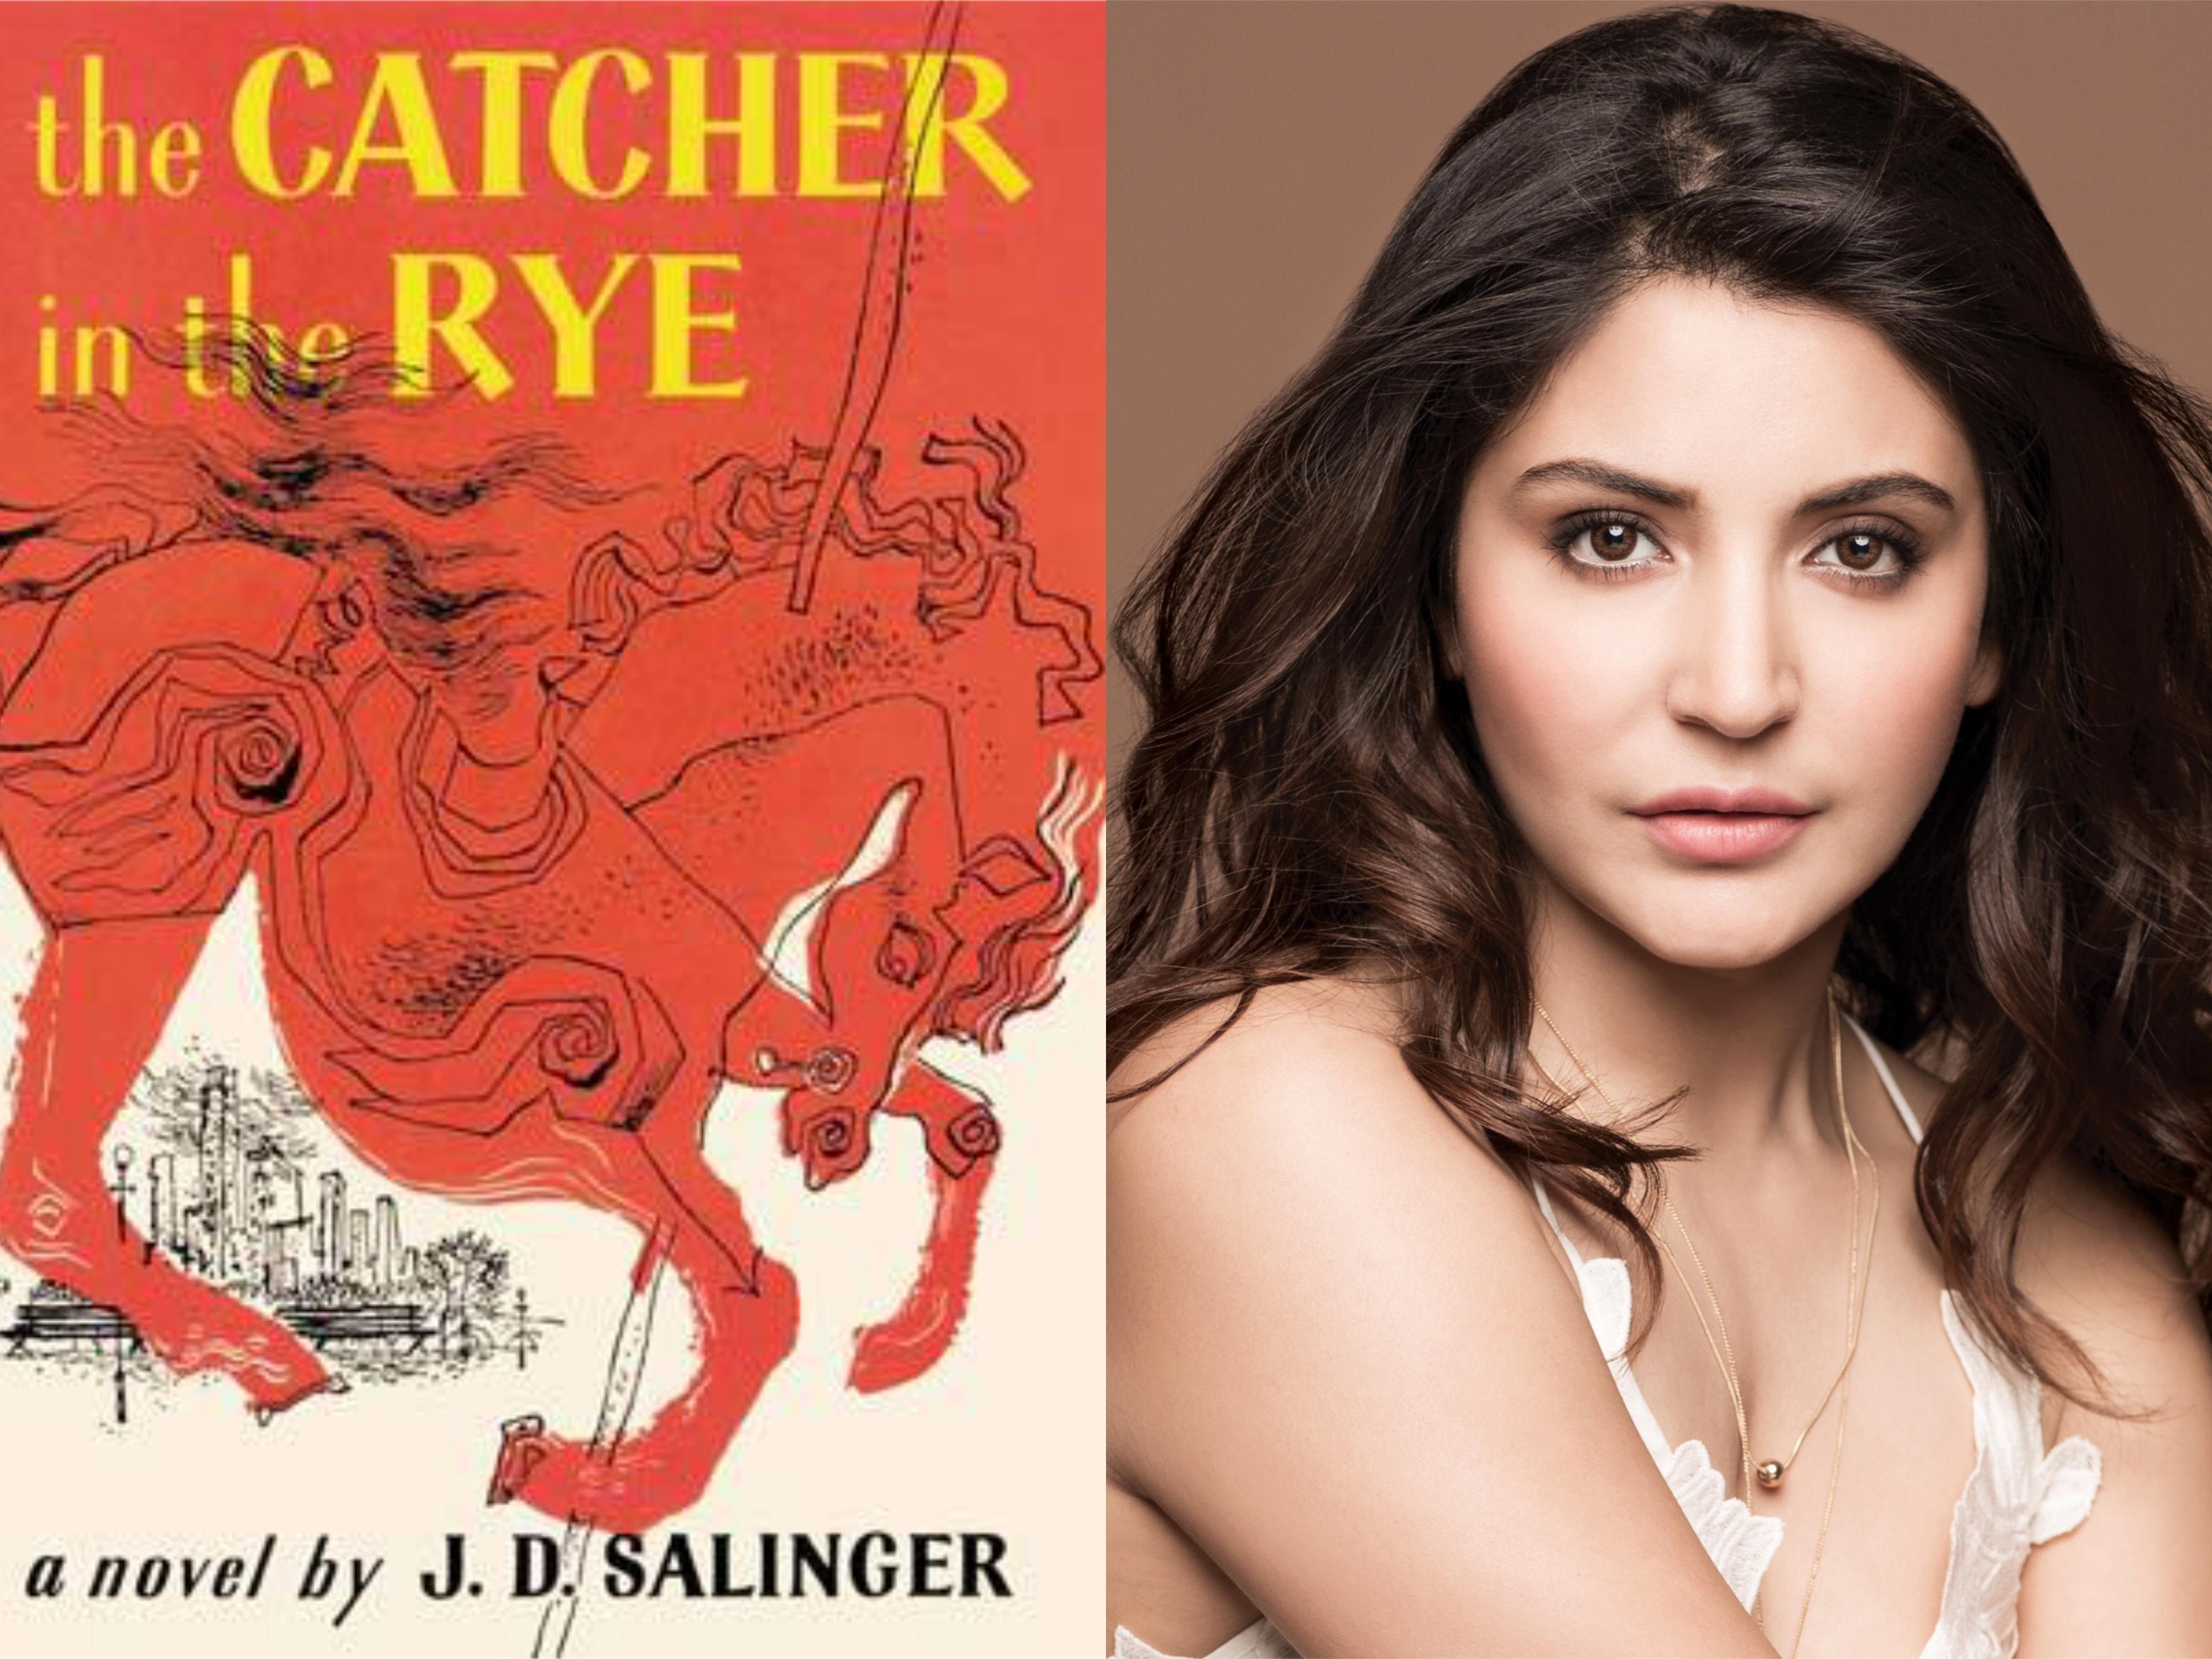 9 Bollywood Celebs & Their Favourite Books